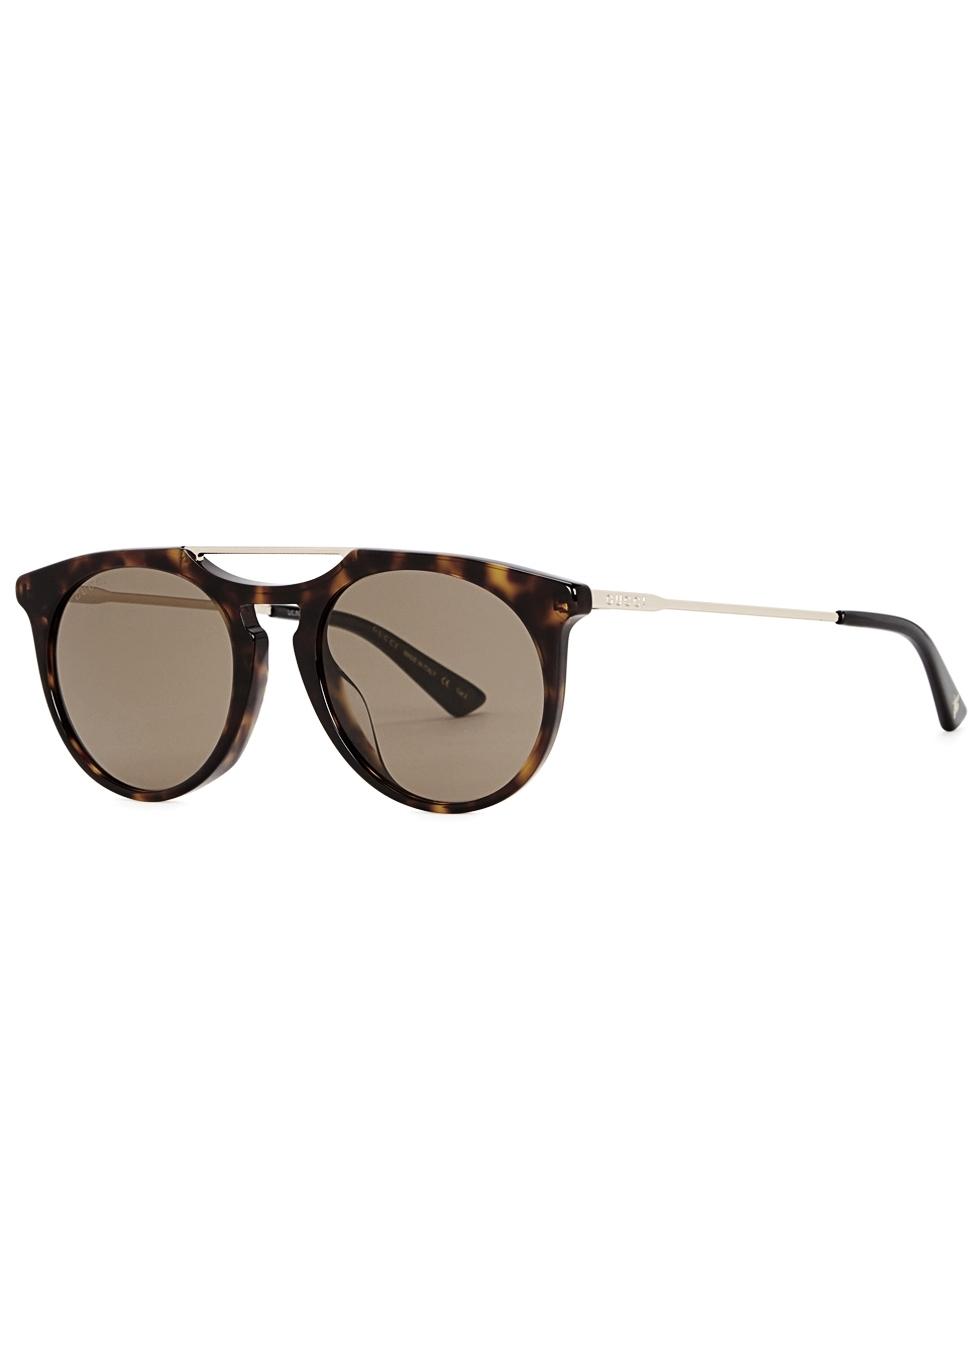 e31c778596 Women s Designer Aviator Sunglasses - Harvey Nichols